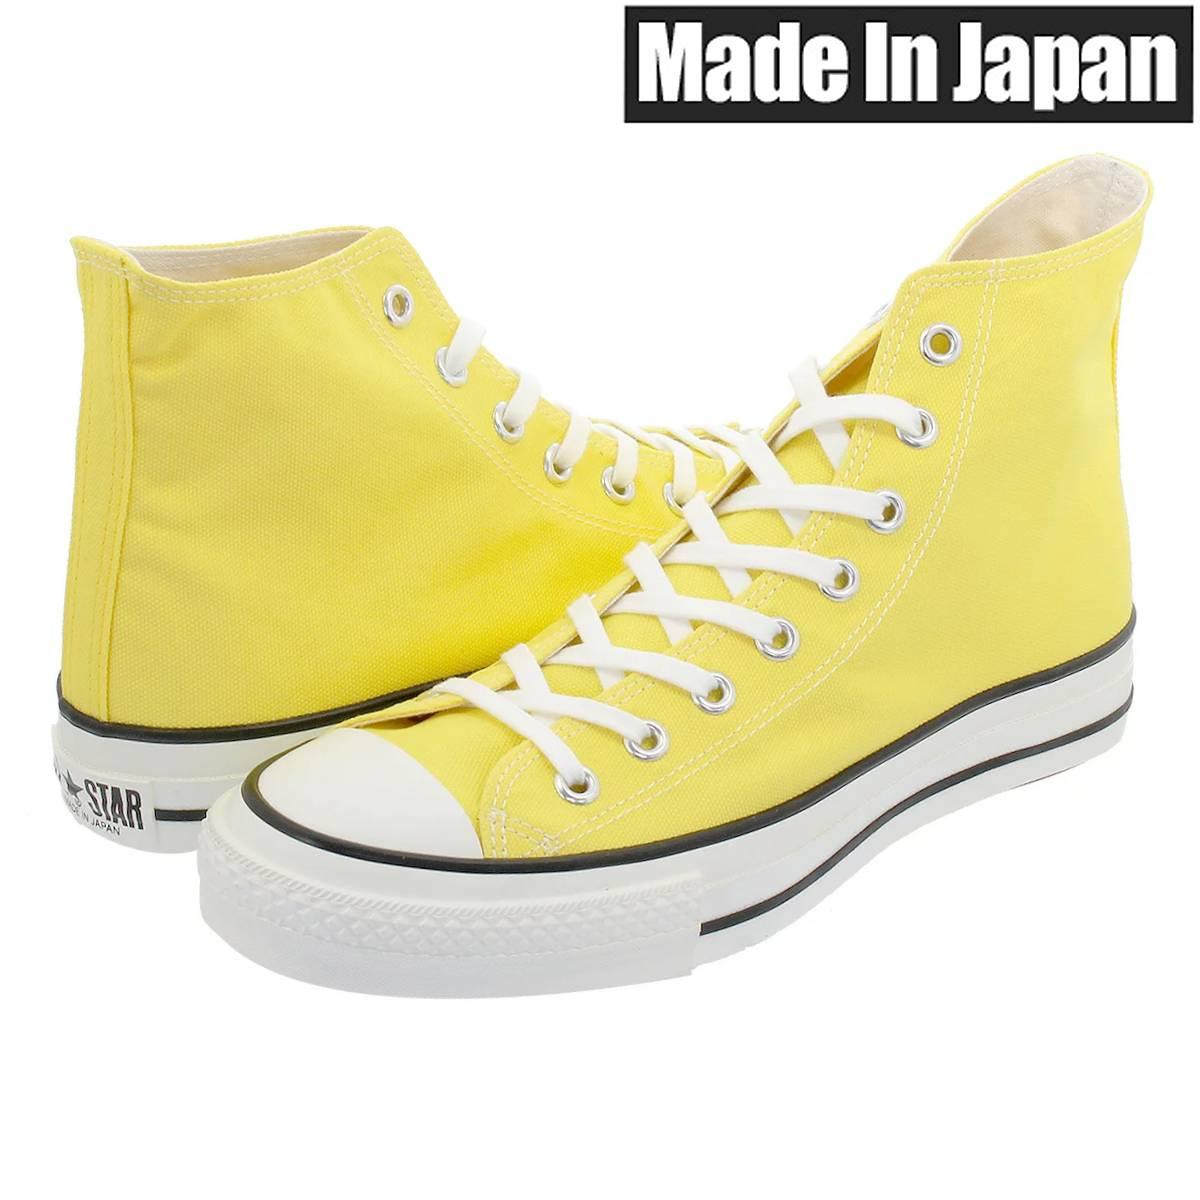 CONVERSE CANVAS ALL STAR HI 【MADE IN JAPAN】【日本製】 コンバース キャンバス オールスター J ハイ YELLOW 32965133